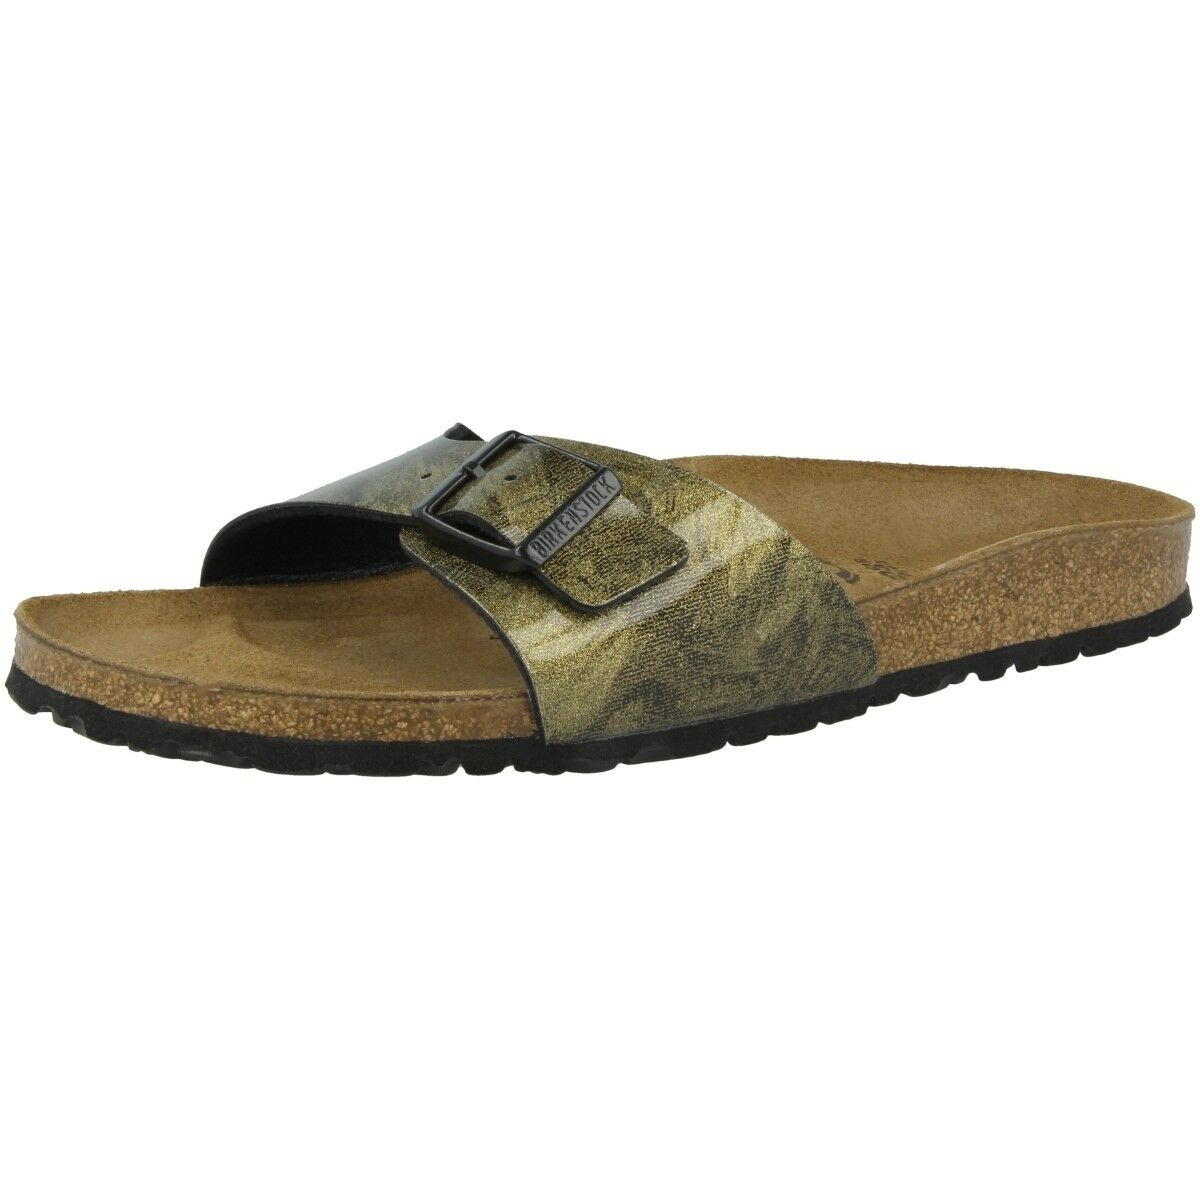 Birkenstock Madrid Birko-Flor Schuhe Sandale Pantoletten Weite schmal 1011175